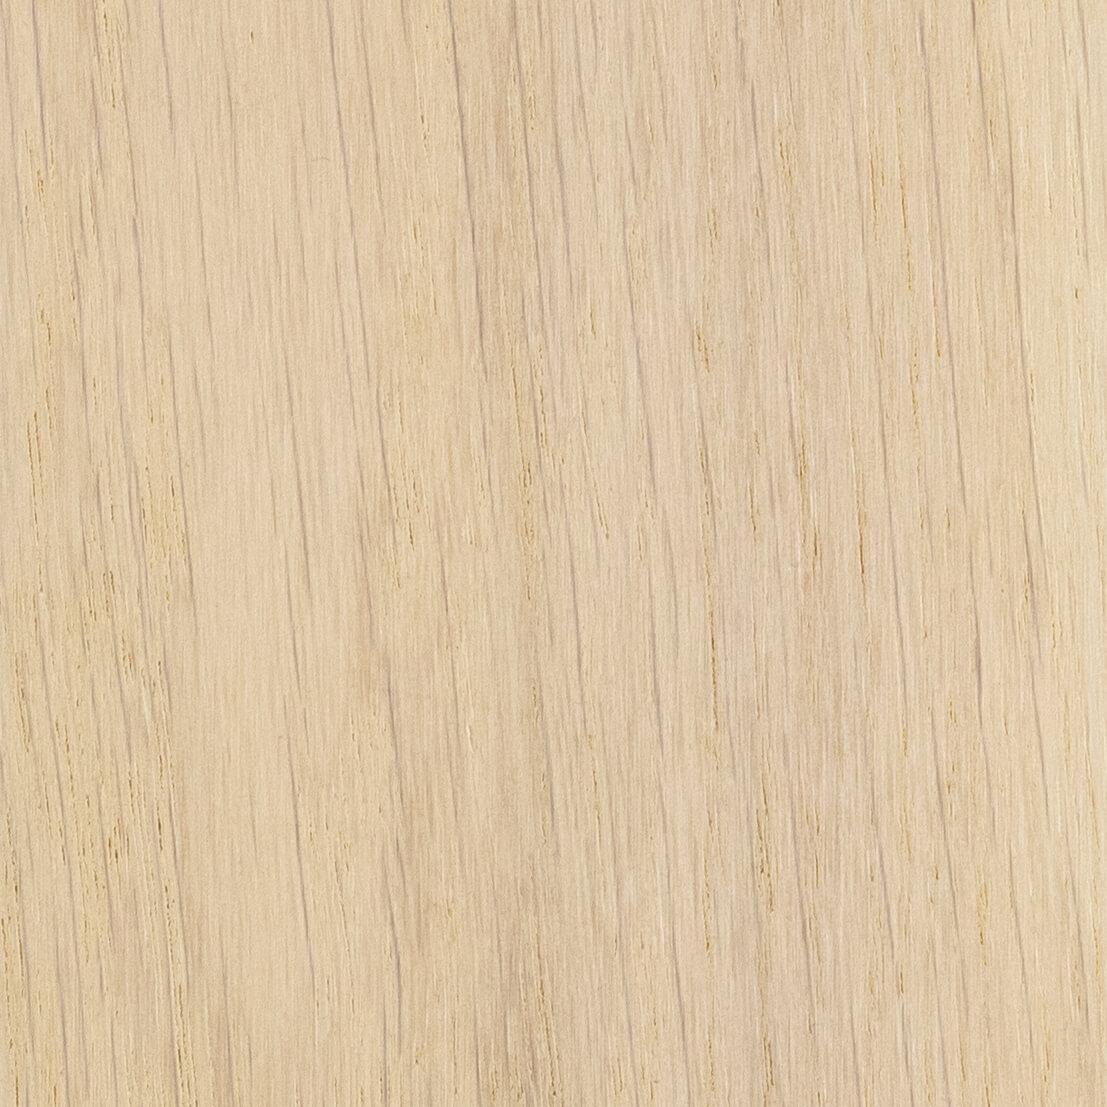 White Wash Eetkamer Tafel.Sparrow Dyyk